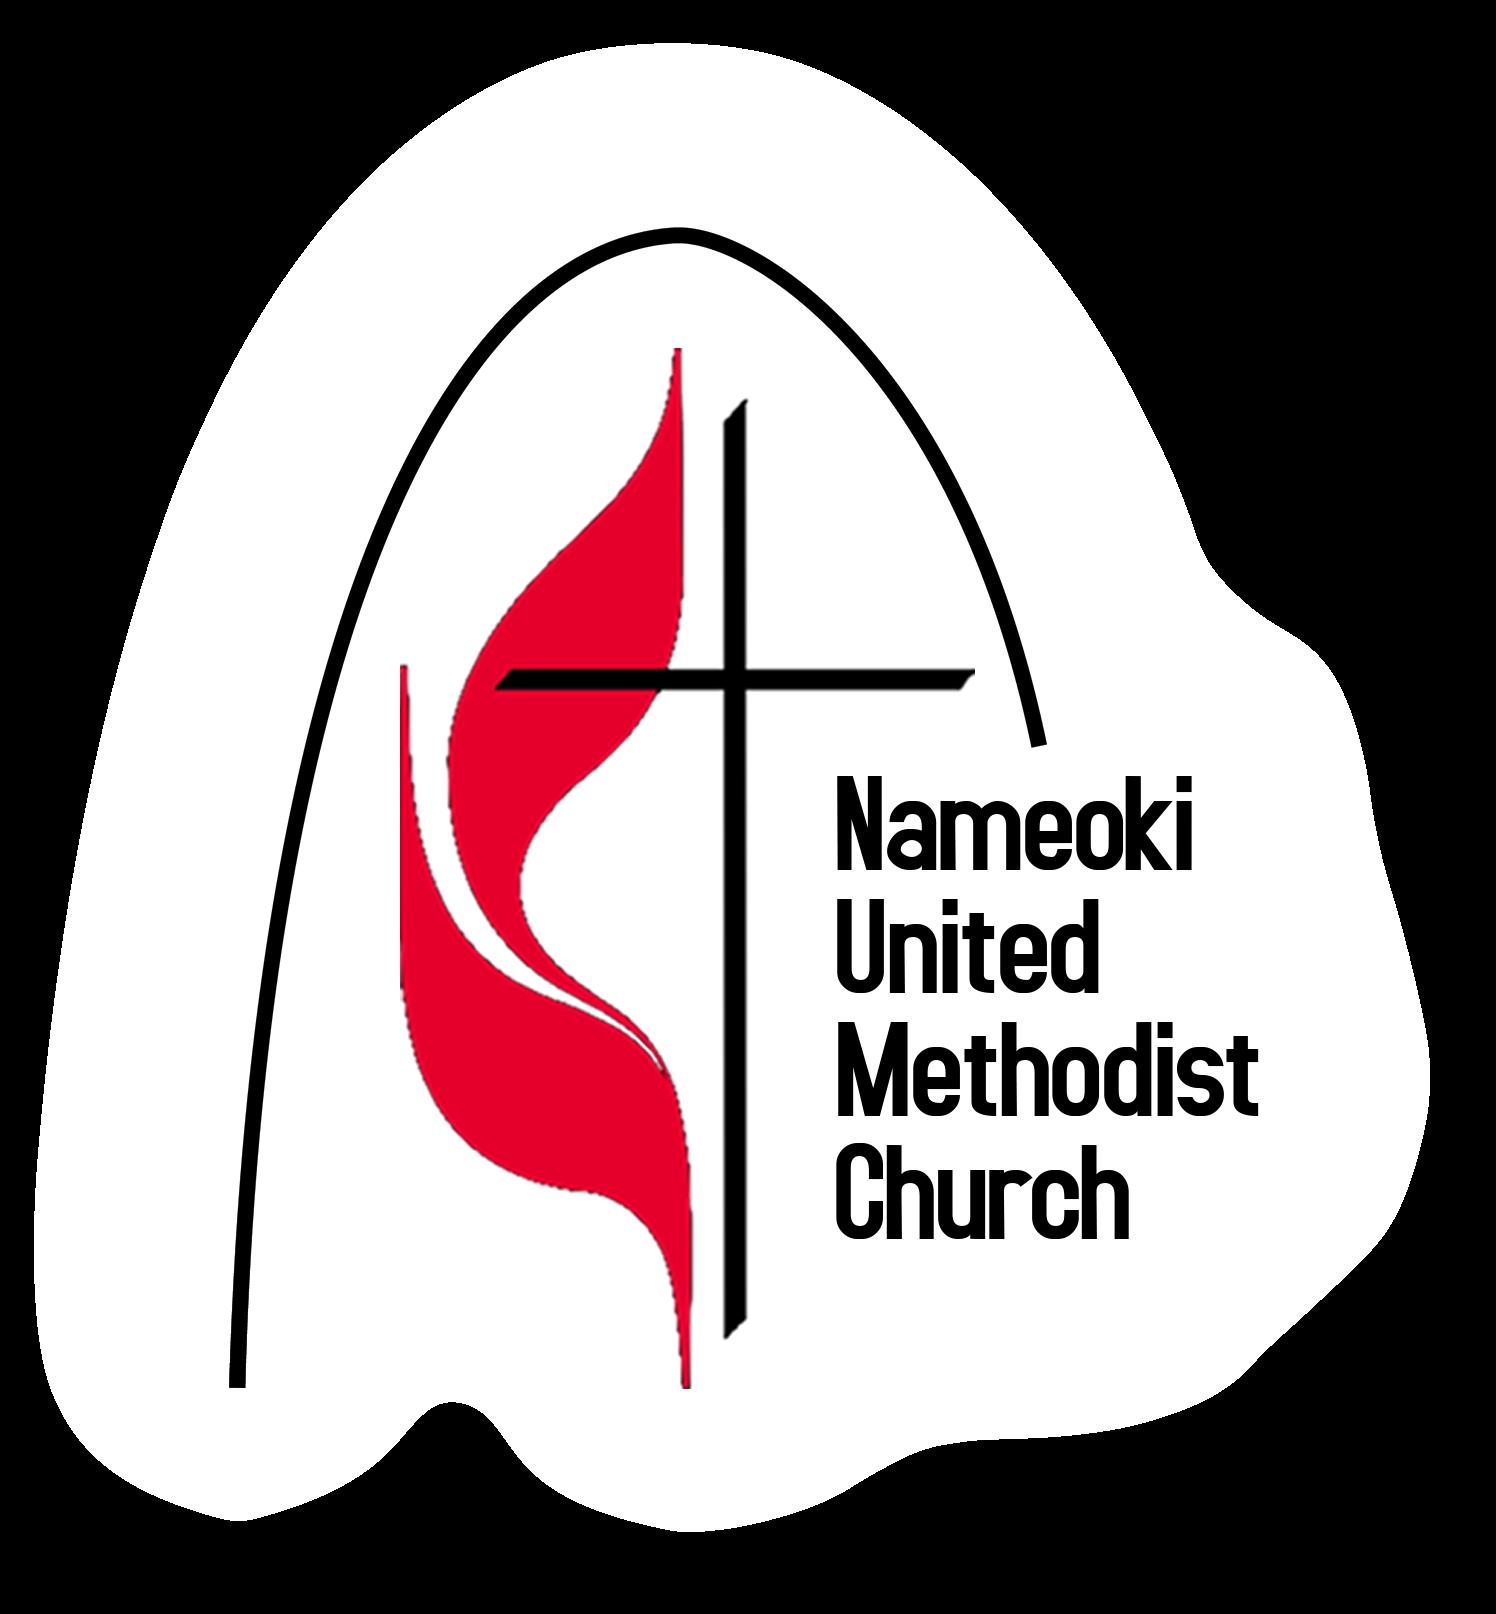 Nameoki United Methodist Church